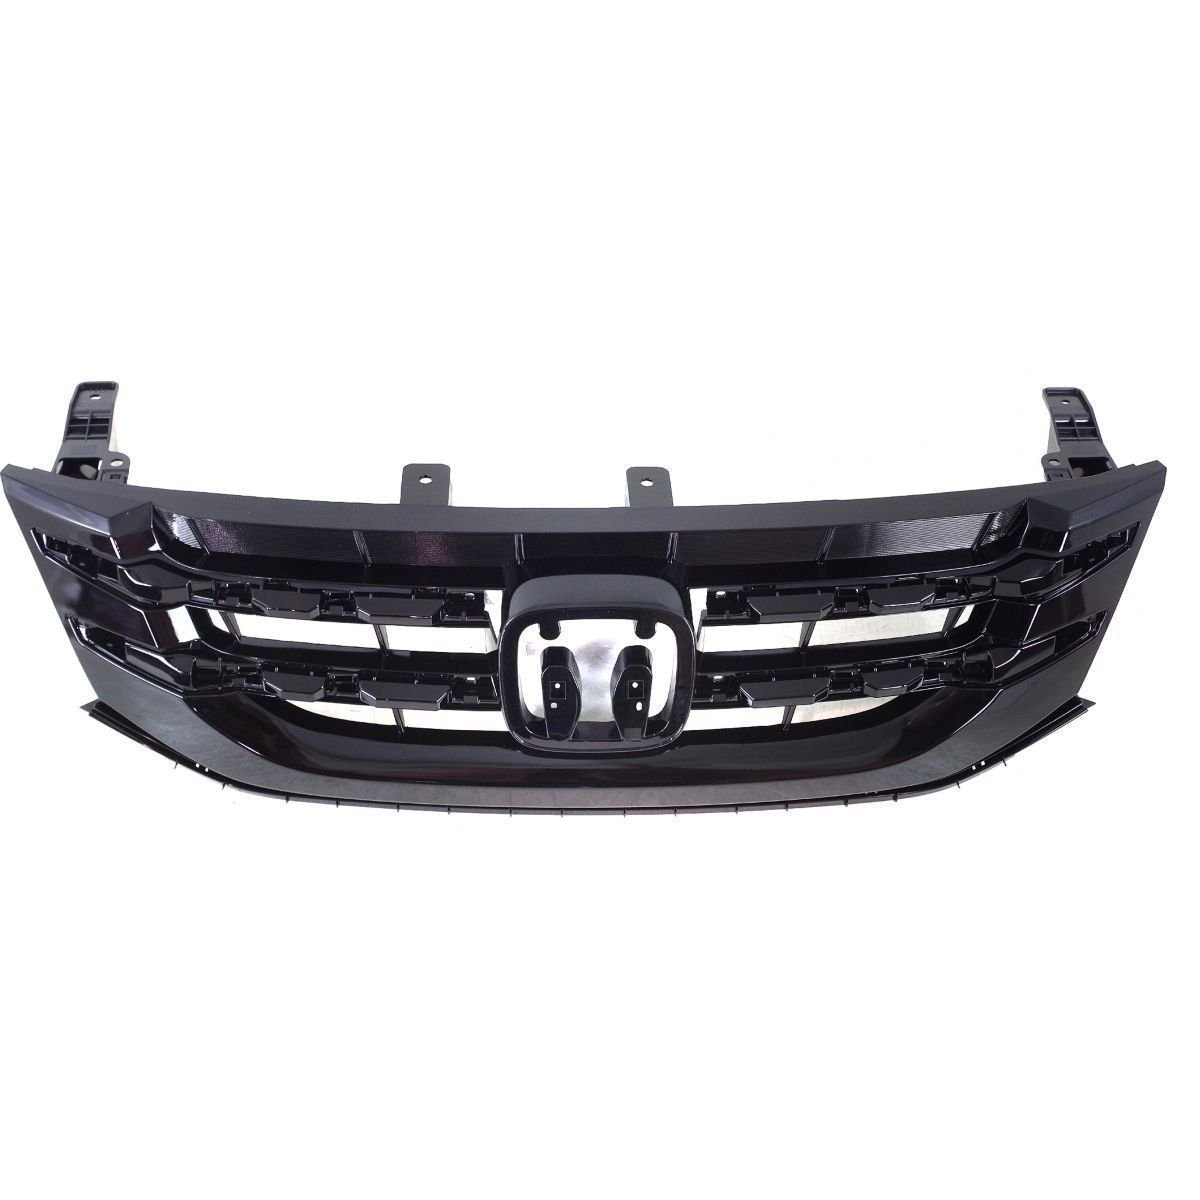 United Auto Supplies UAS-3762 Interior Inside Door Handle Right Texture Black